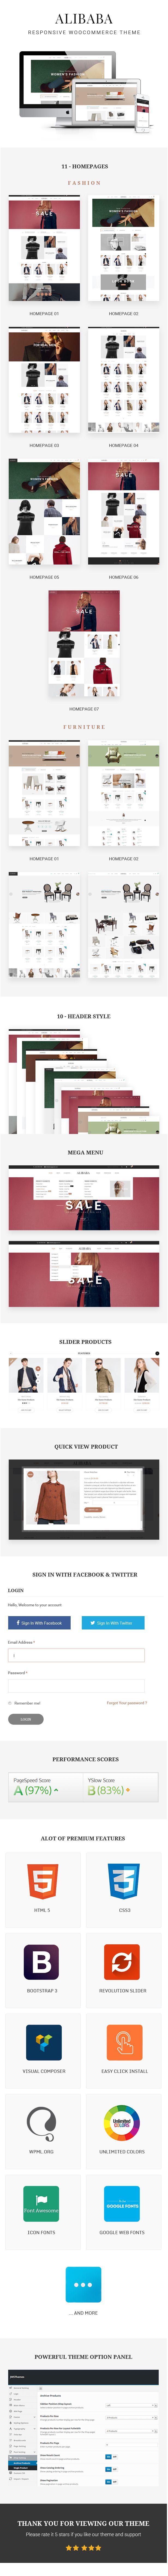 Shopping and Furniture WooCommerce WordPress Theme